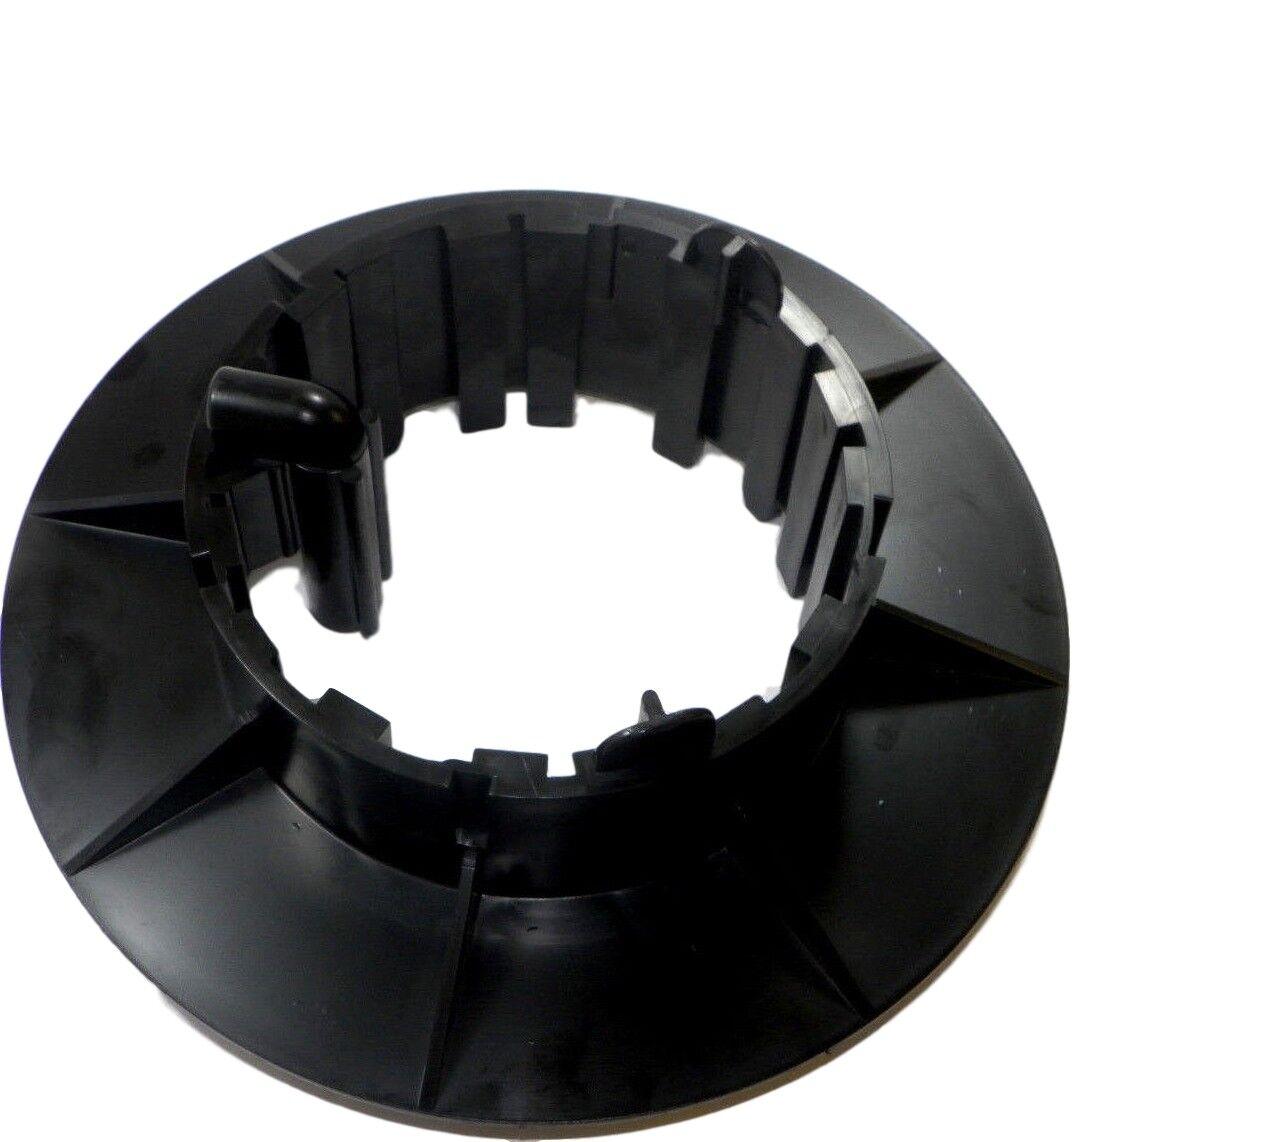 Pentair 160317 150 200 Sq Ft 59053800 Center Core Filter Cartridge Base